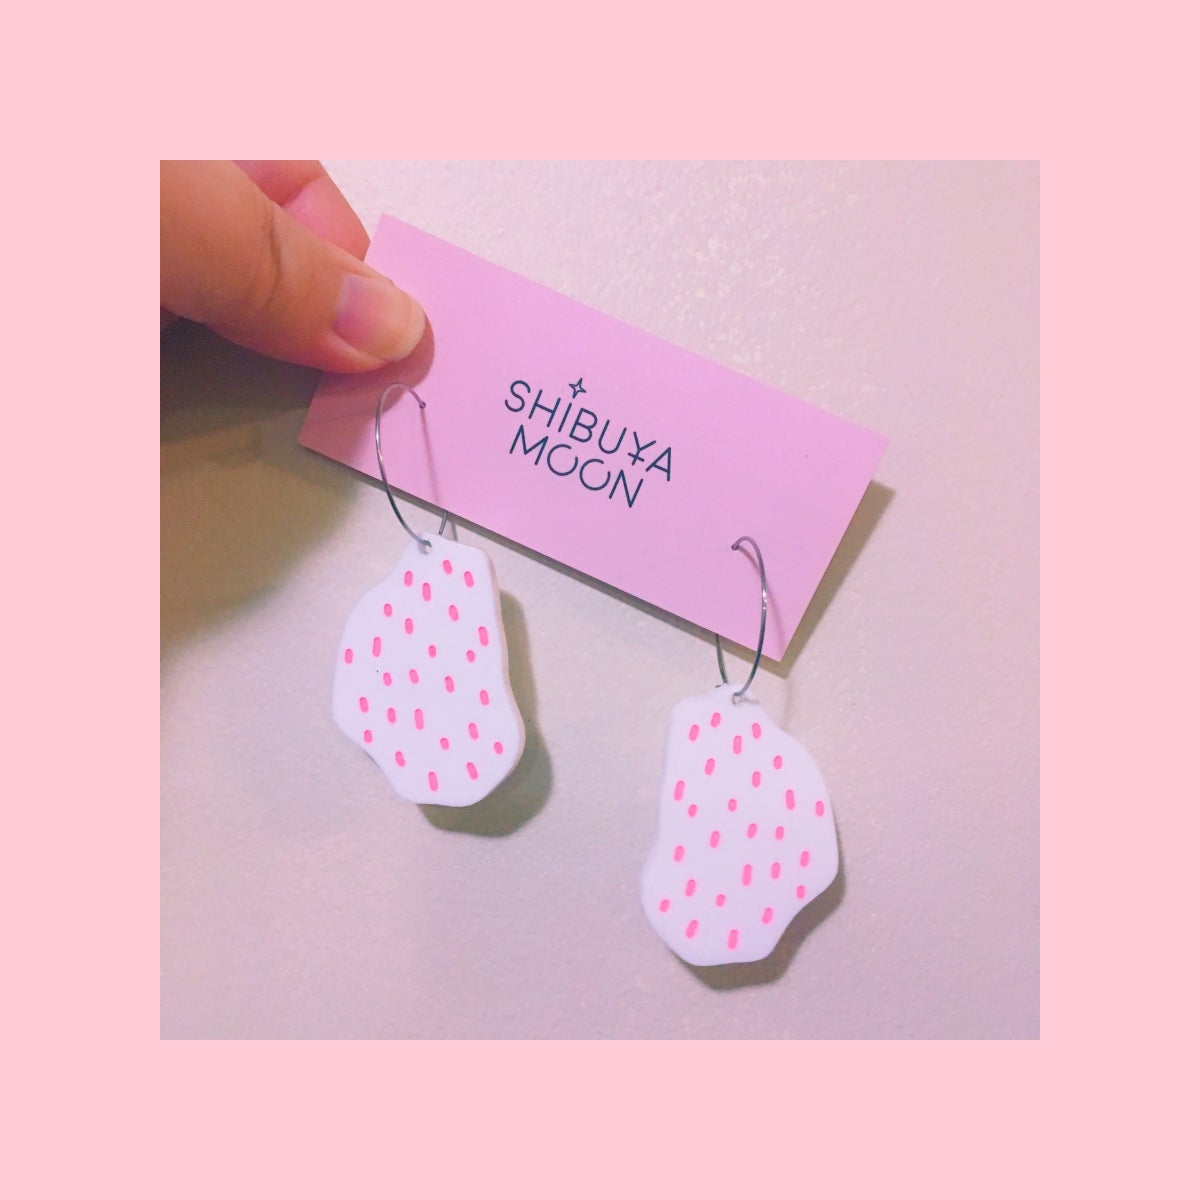 Image of Confetti Rocks Mini Hoops (White/Neon Pink)